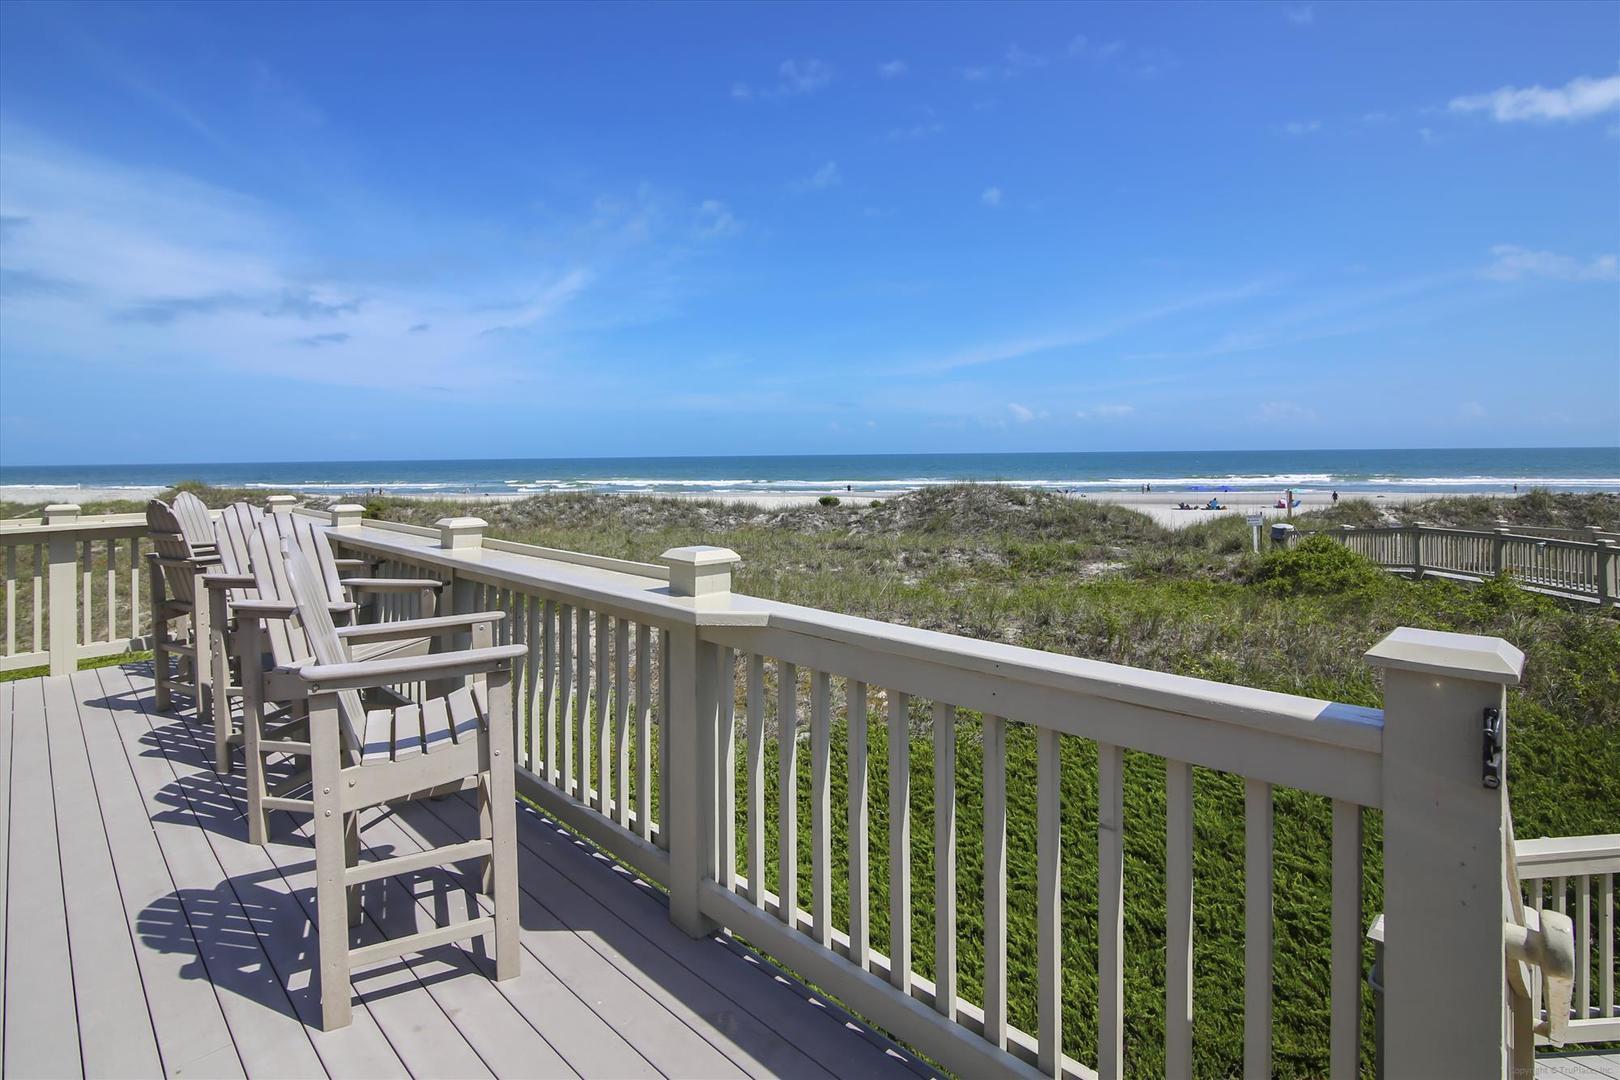 Ocean Creek NN9 - View from Beach Cabana Grill